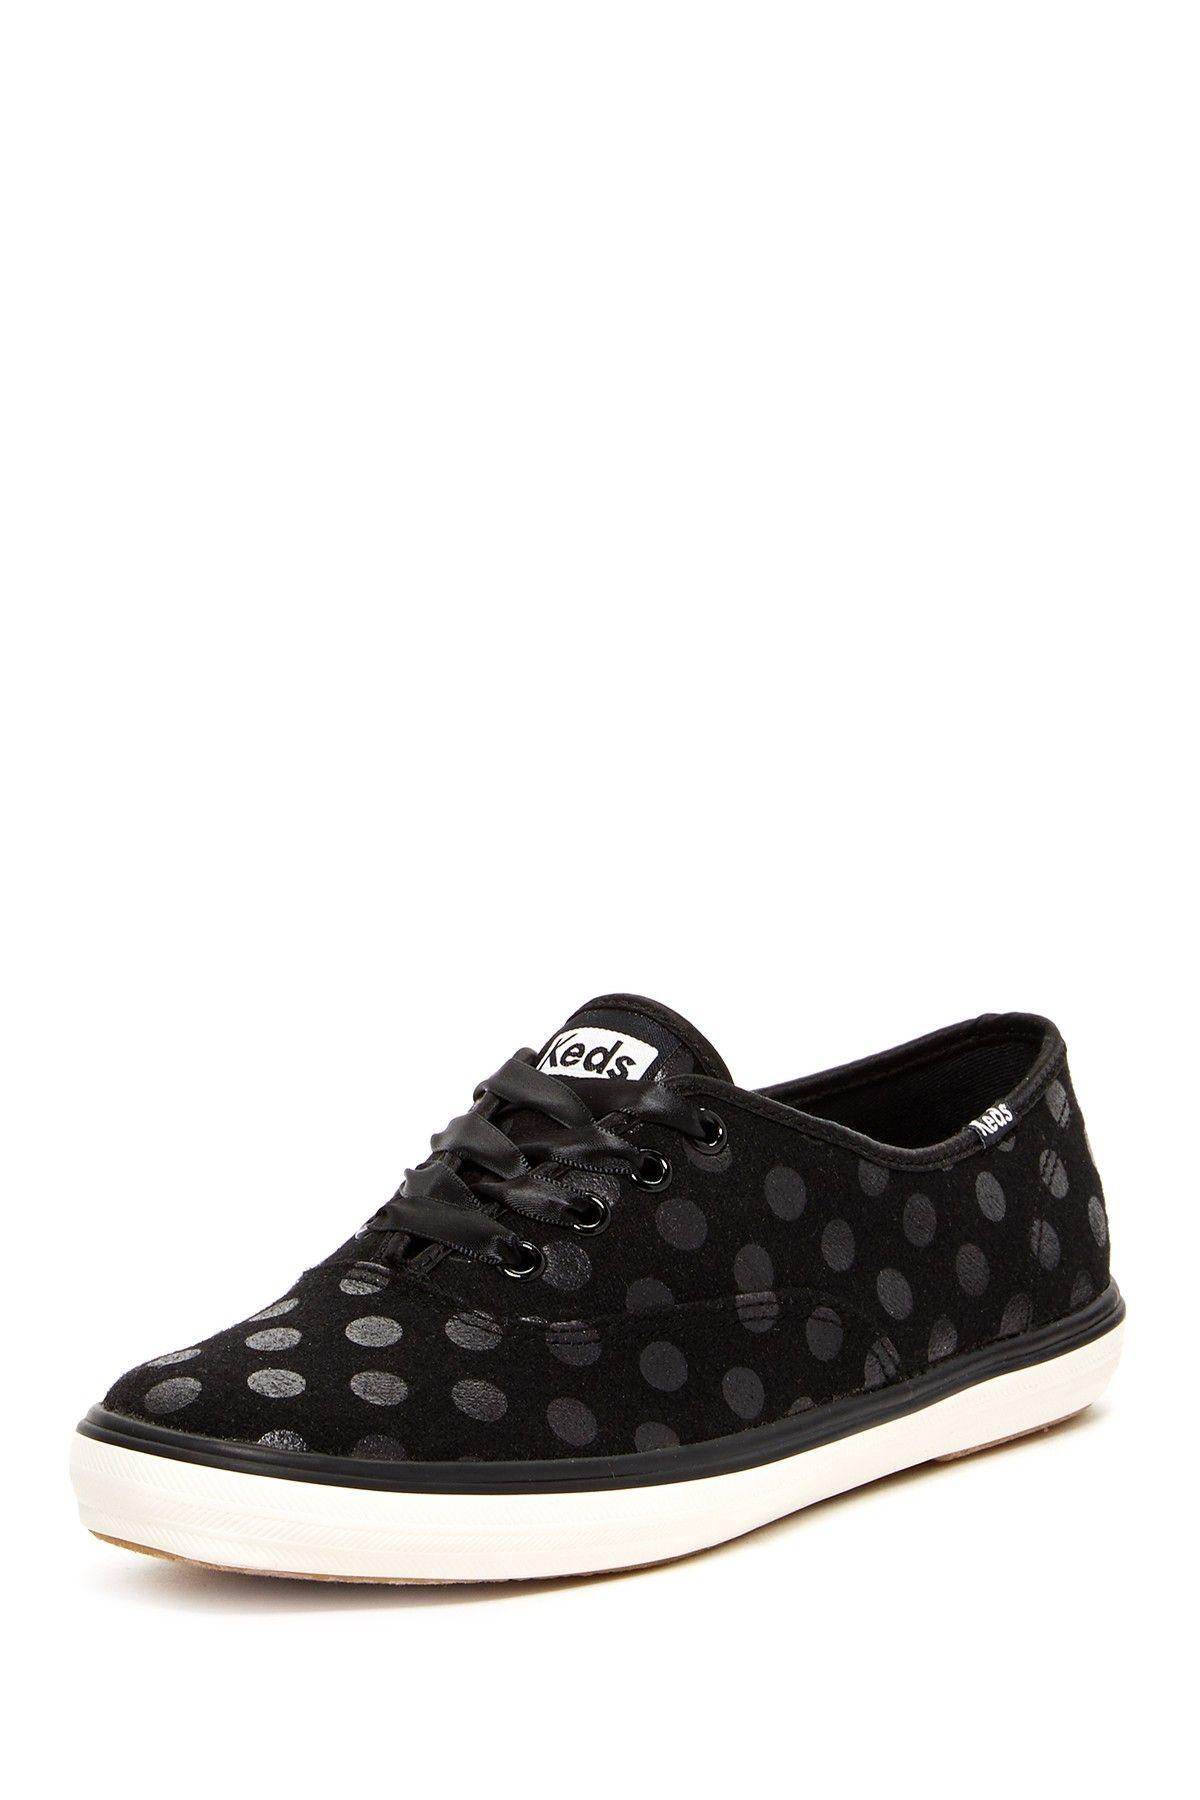 862d30a2a6a Keds Champion Wool Blend Dot Lace-Up Sneaker